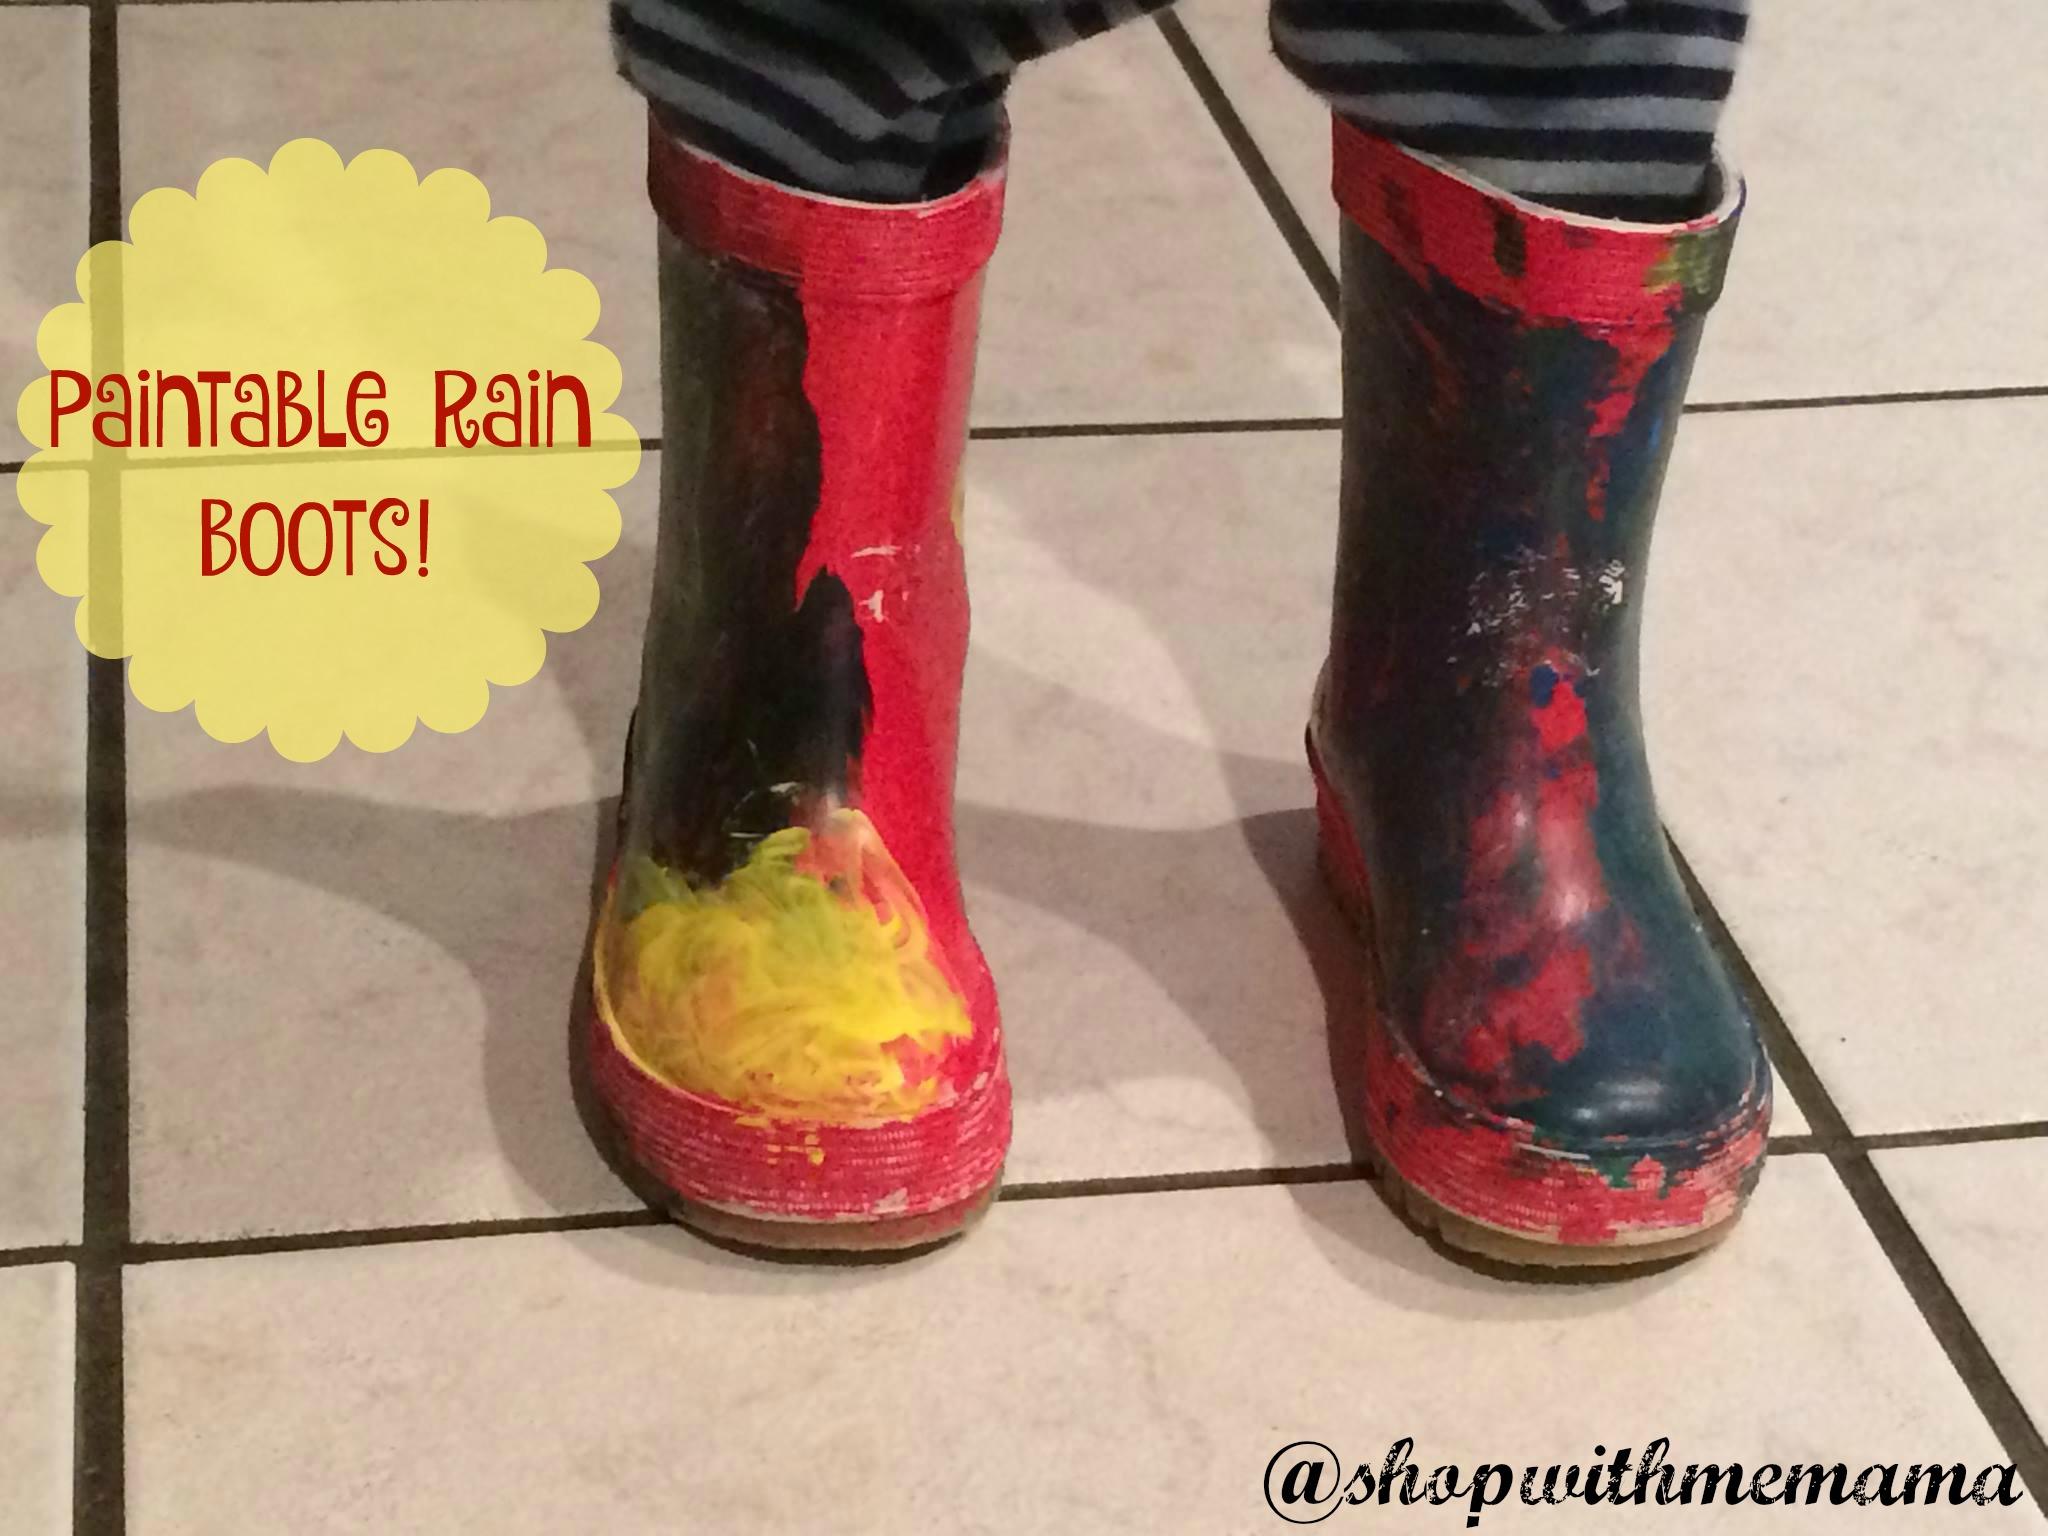 mY DESIGN paintable rain boots